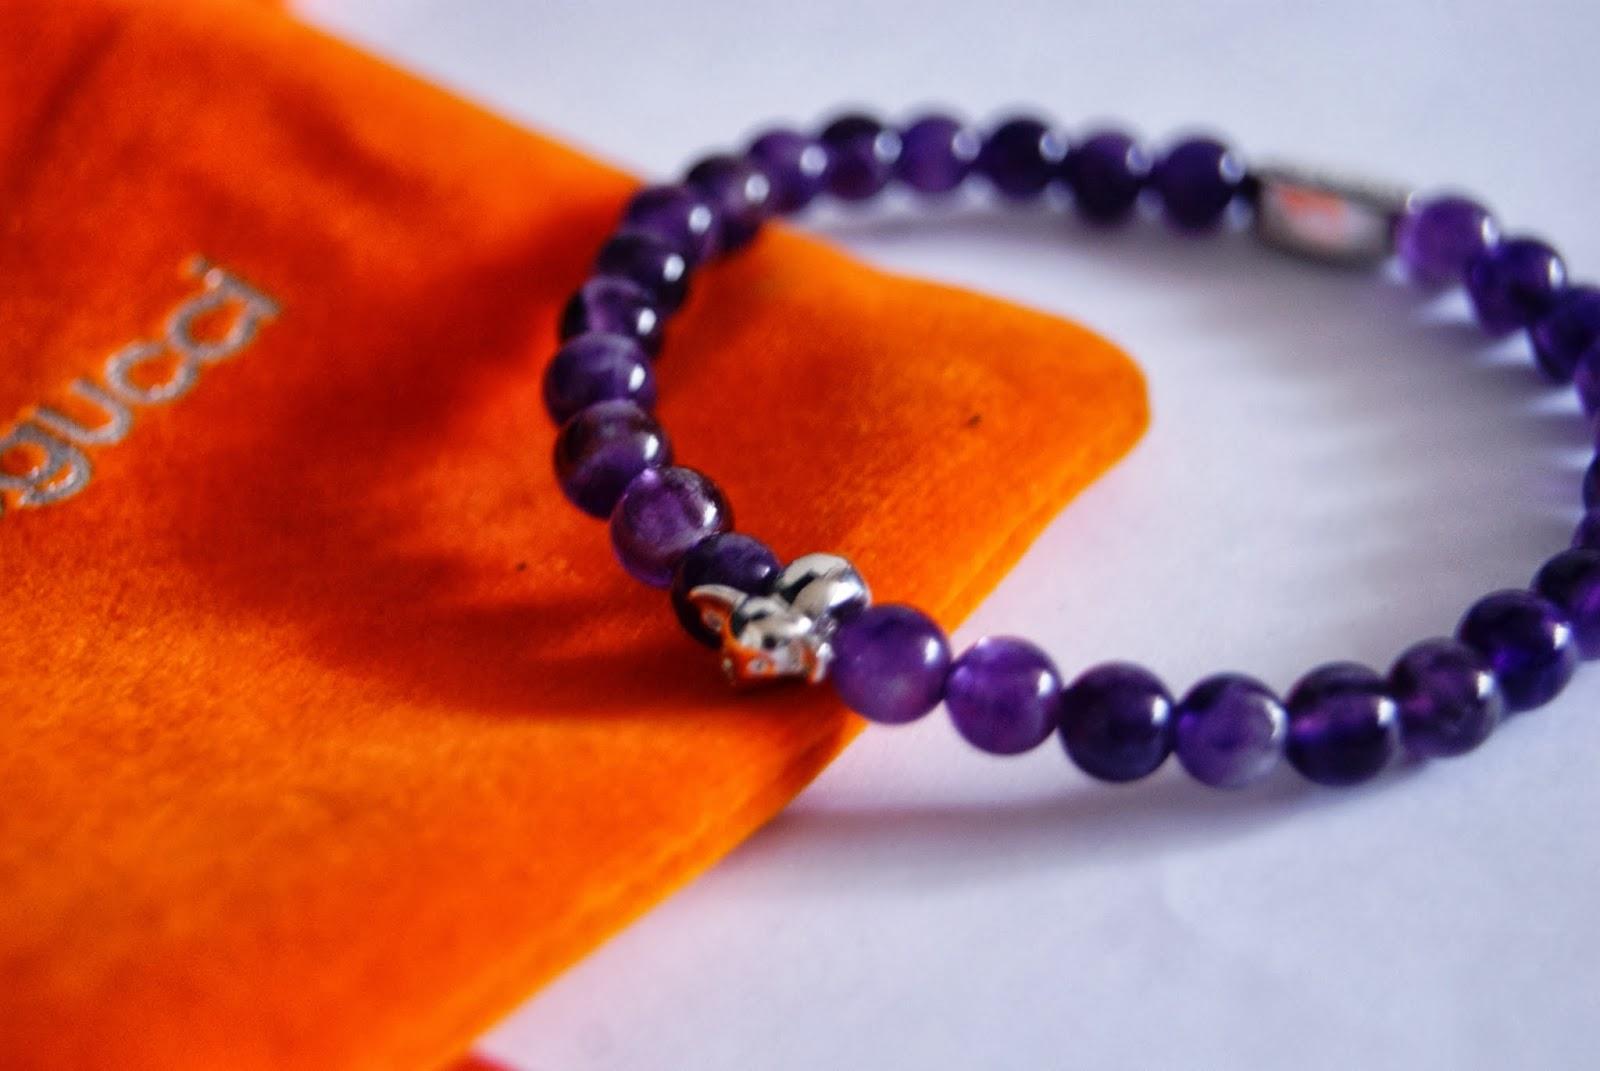 Joseph Nogucci Memory Stone Elephant Bracelets: Purple Amethyst Friendship, White Jade Renewal, Red Coral Love Fashion Style Jewlery Melanie.Ps The Purple Scarf Toronto Canadian